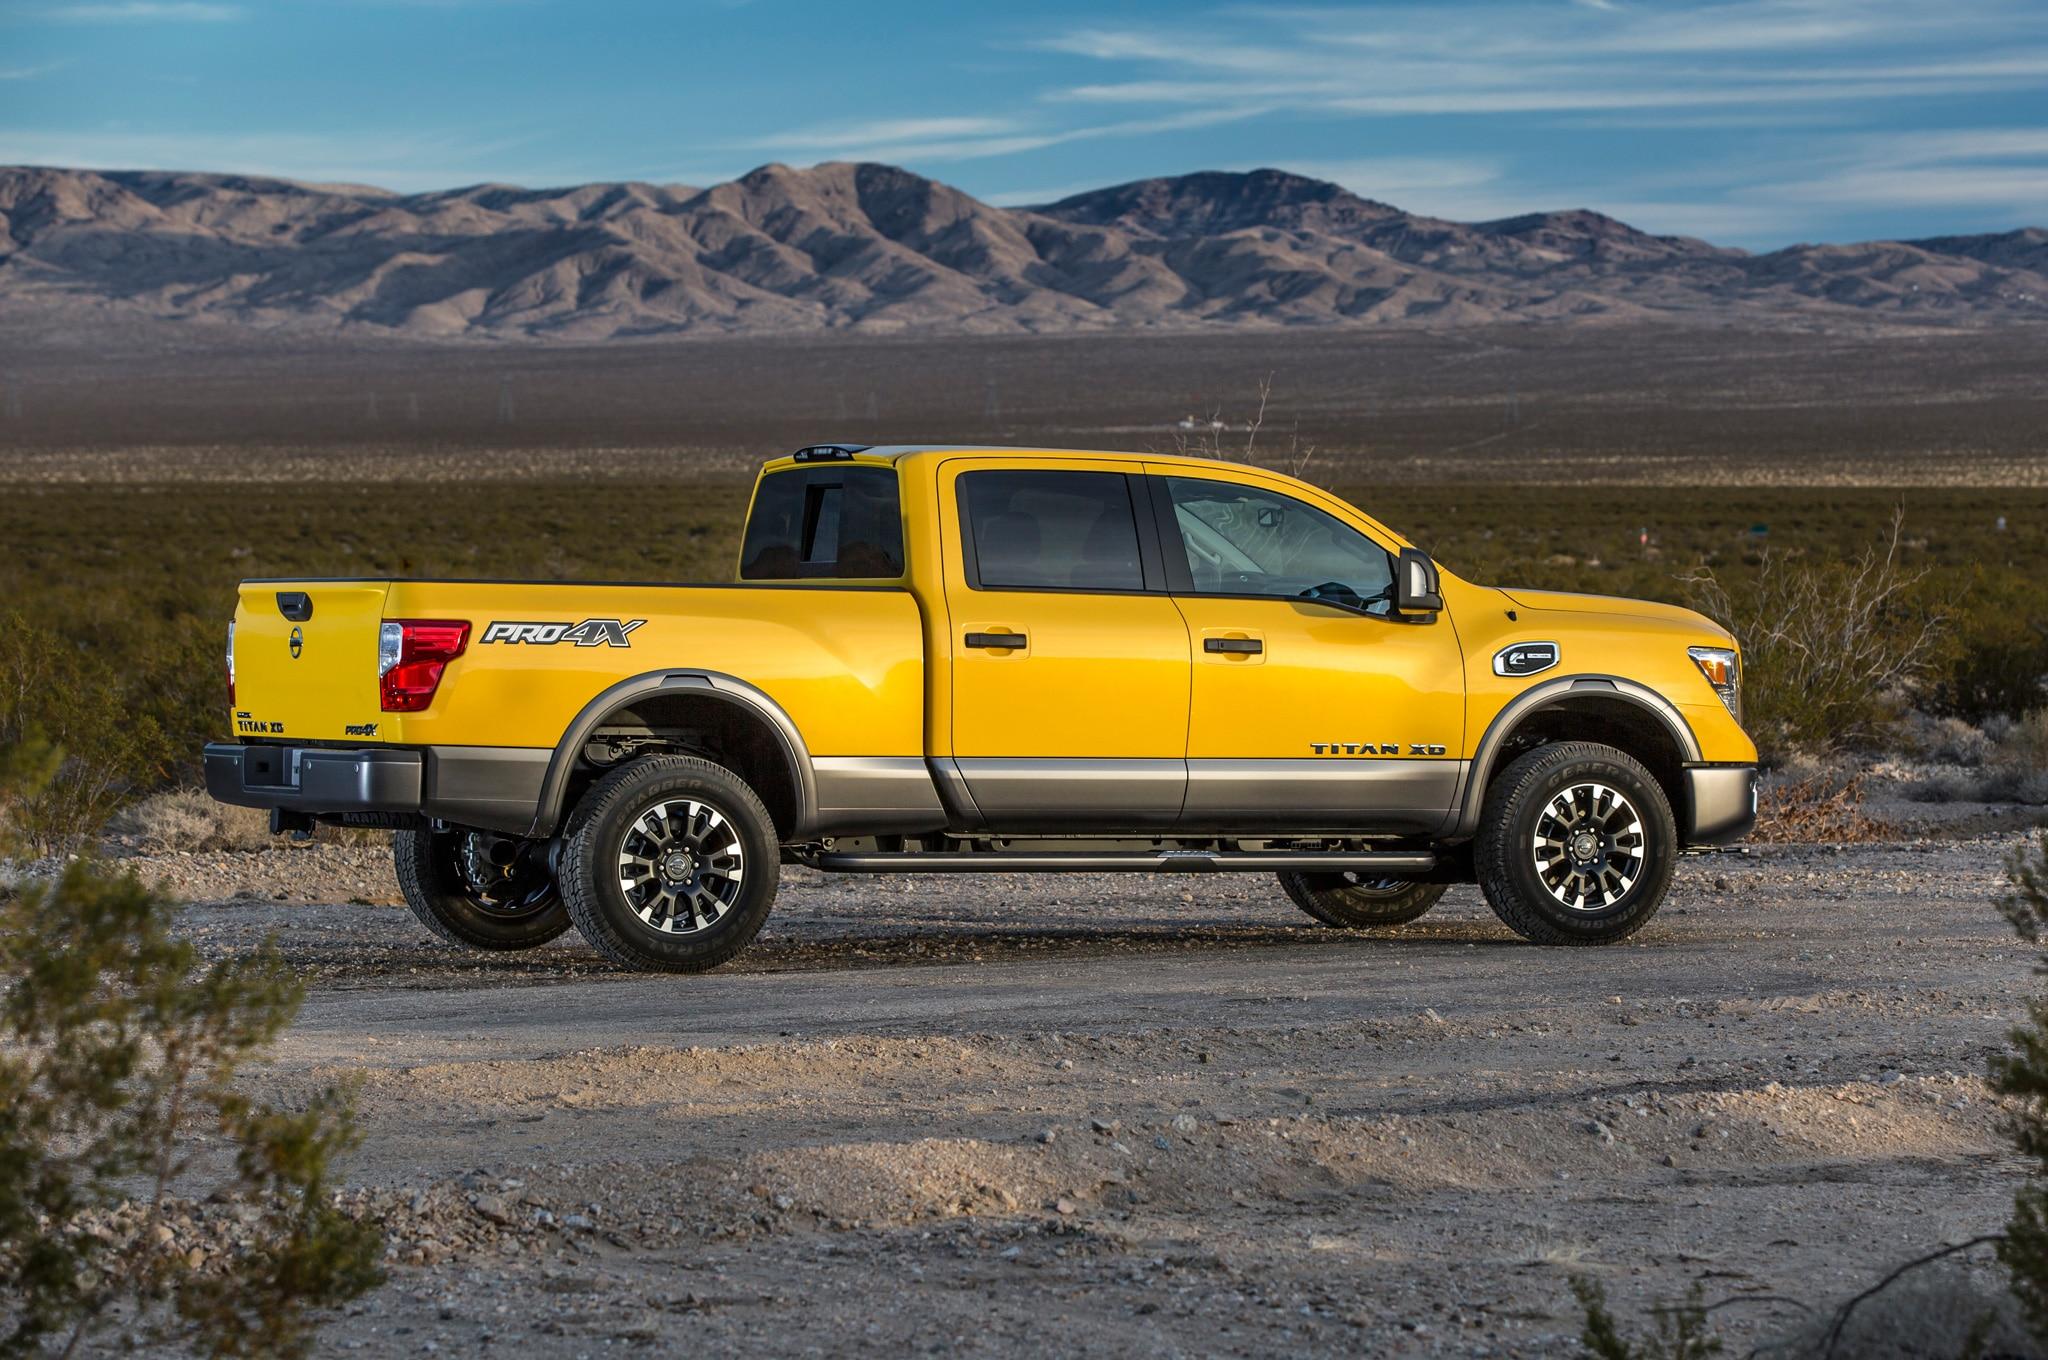 2016 Nissan Titan XD Diesel Starts at $41,485